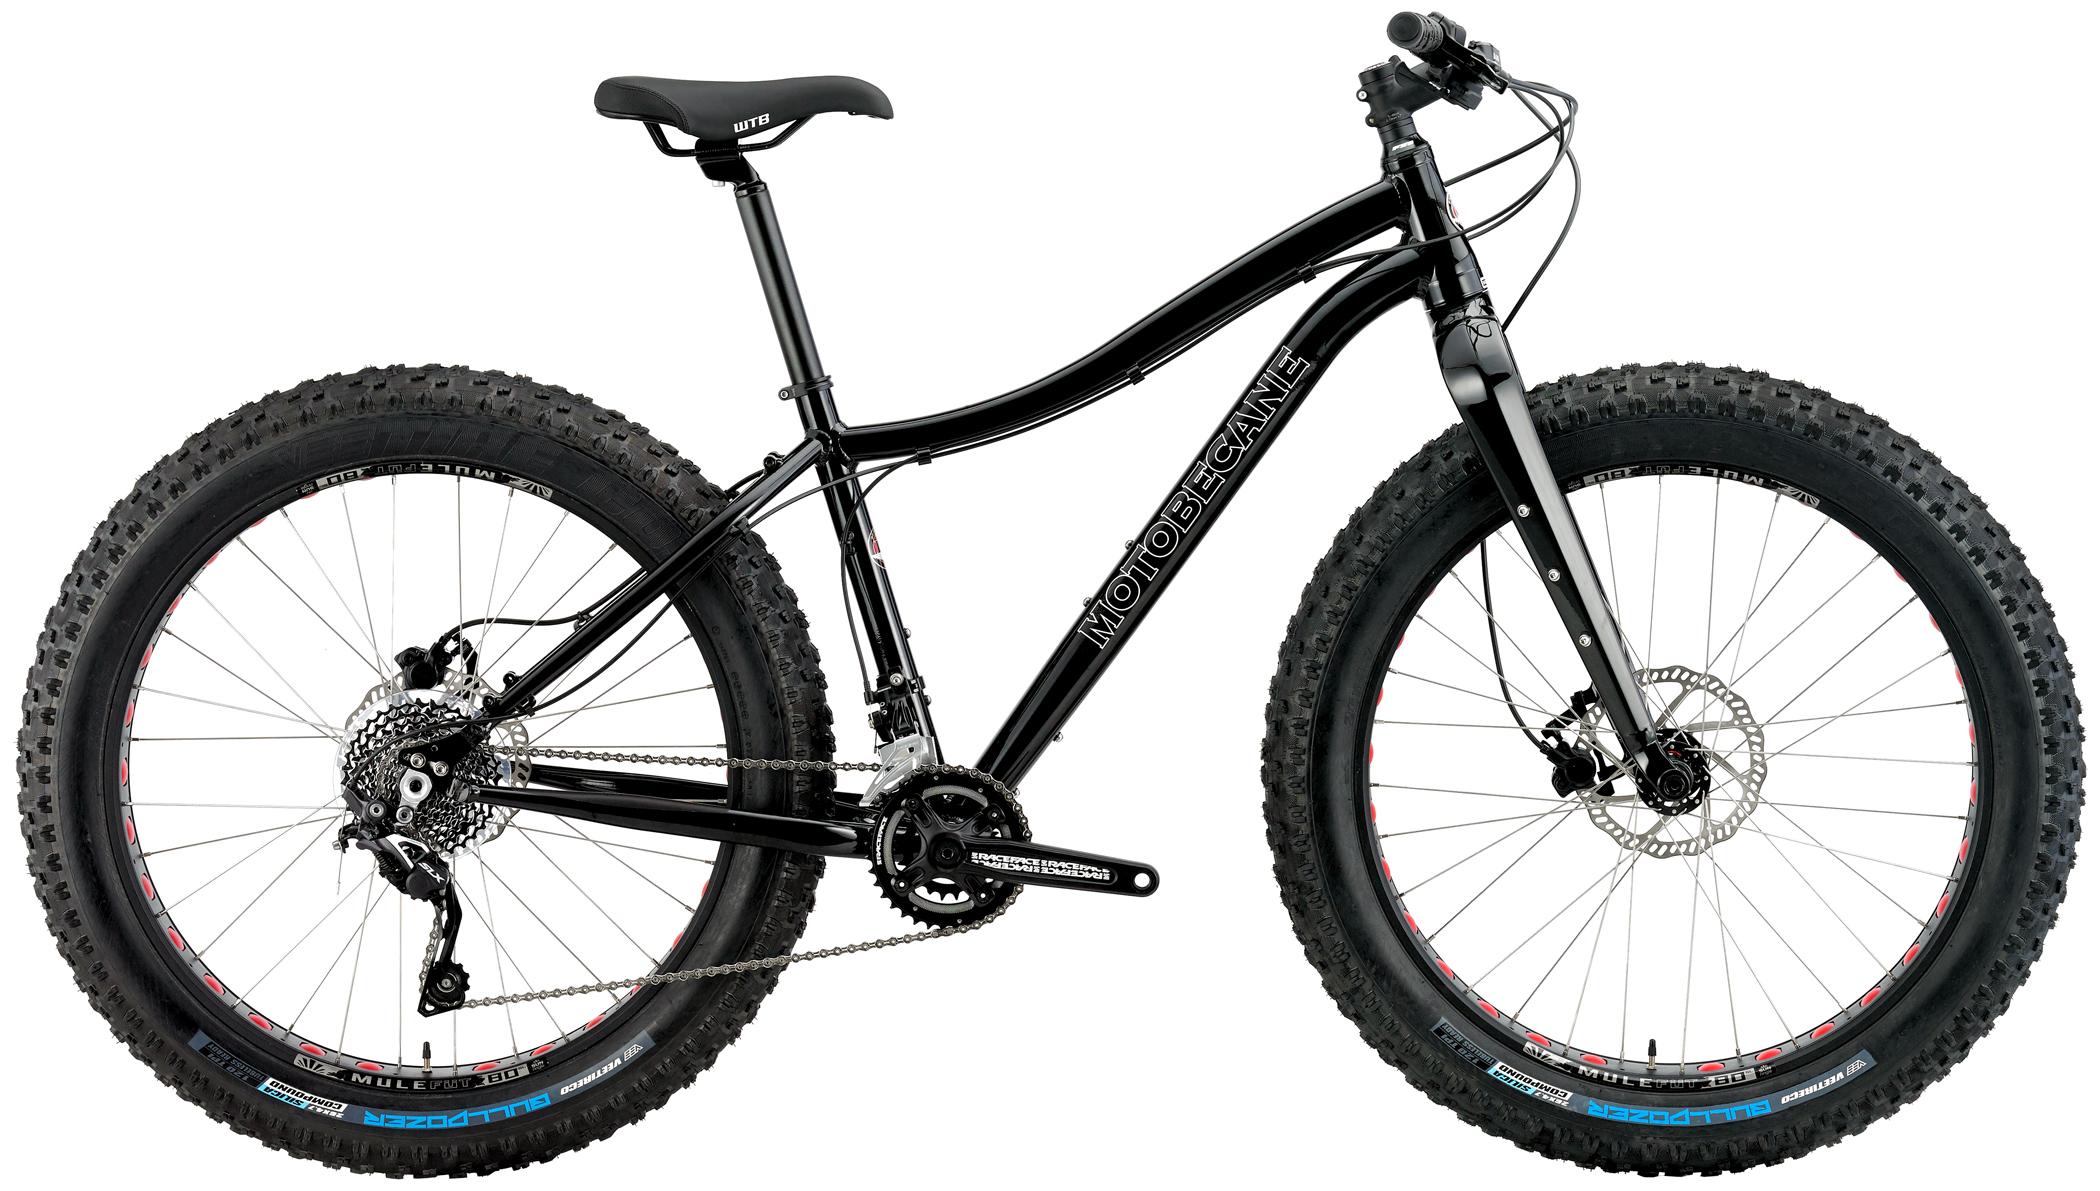 Motobecane Boris The Brut Complete Fat Bikes With